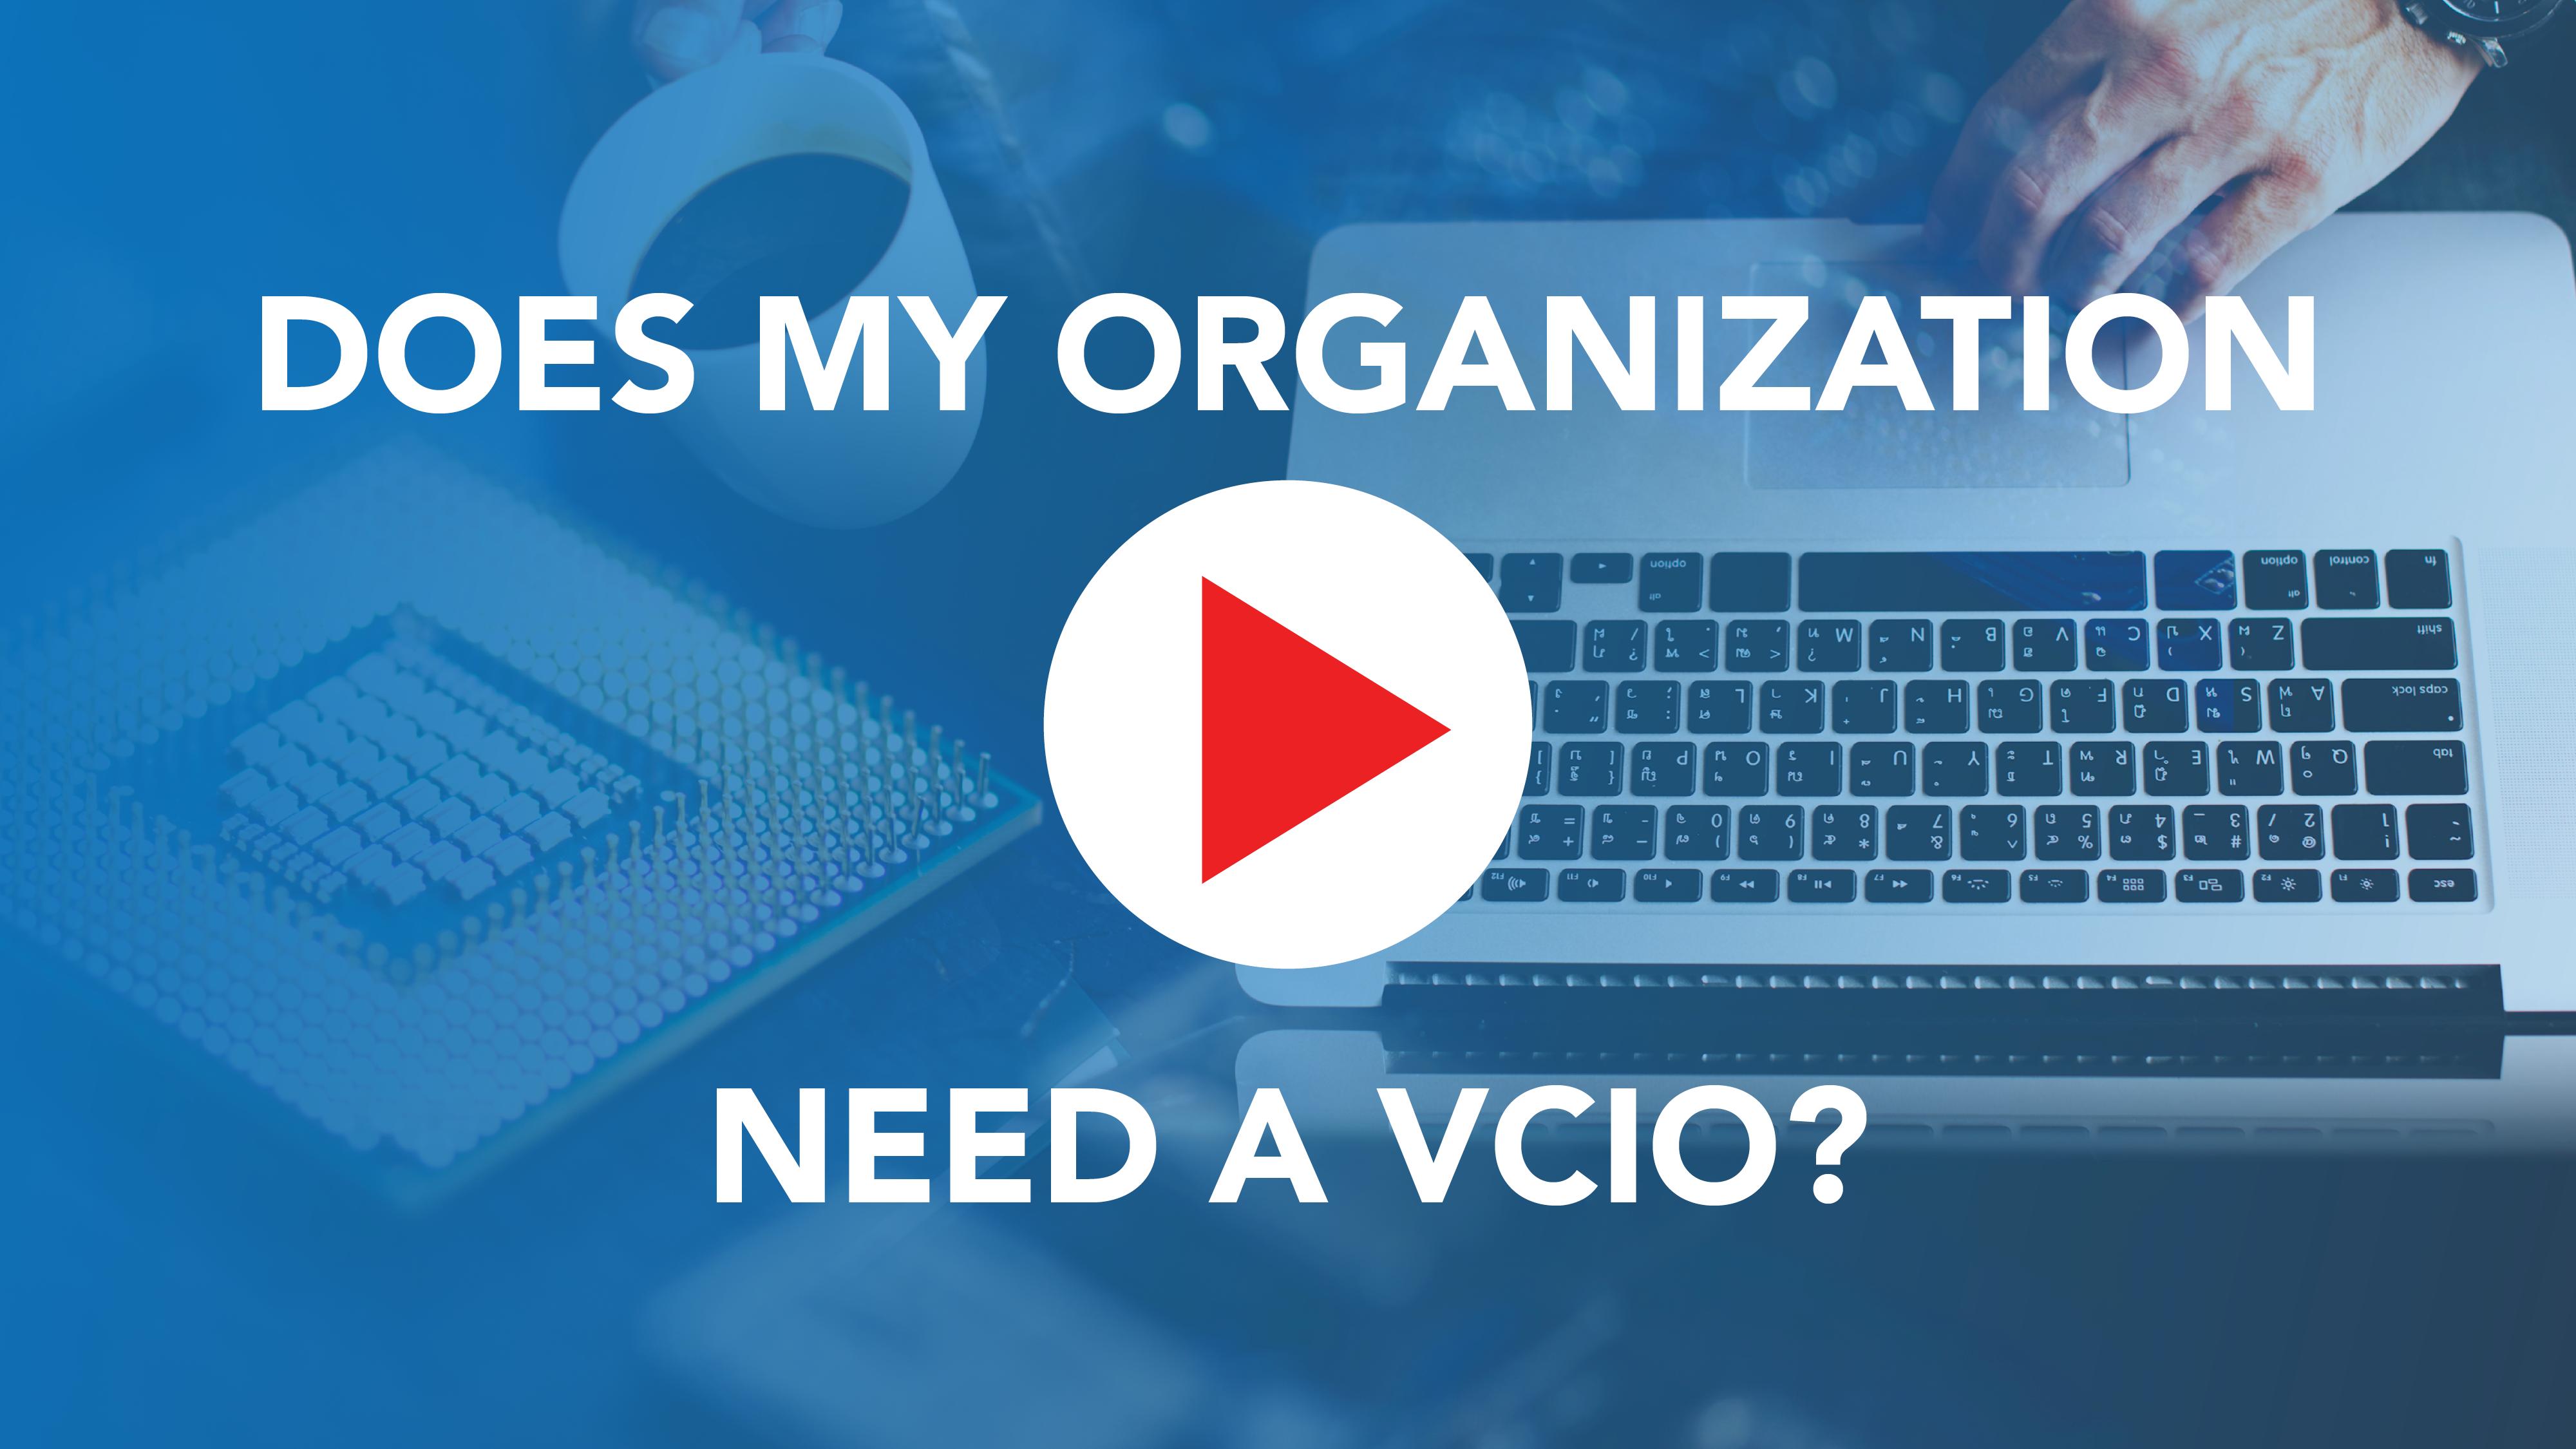 Does my organization need a vCIO?